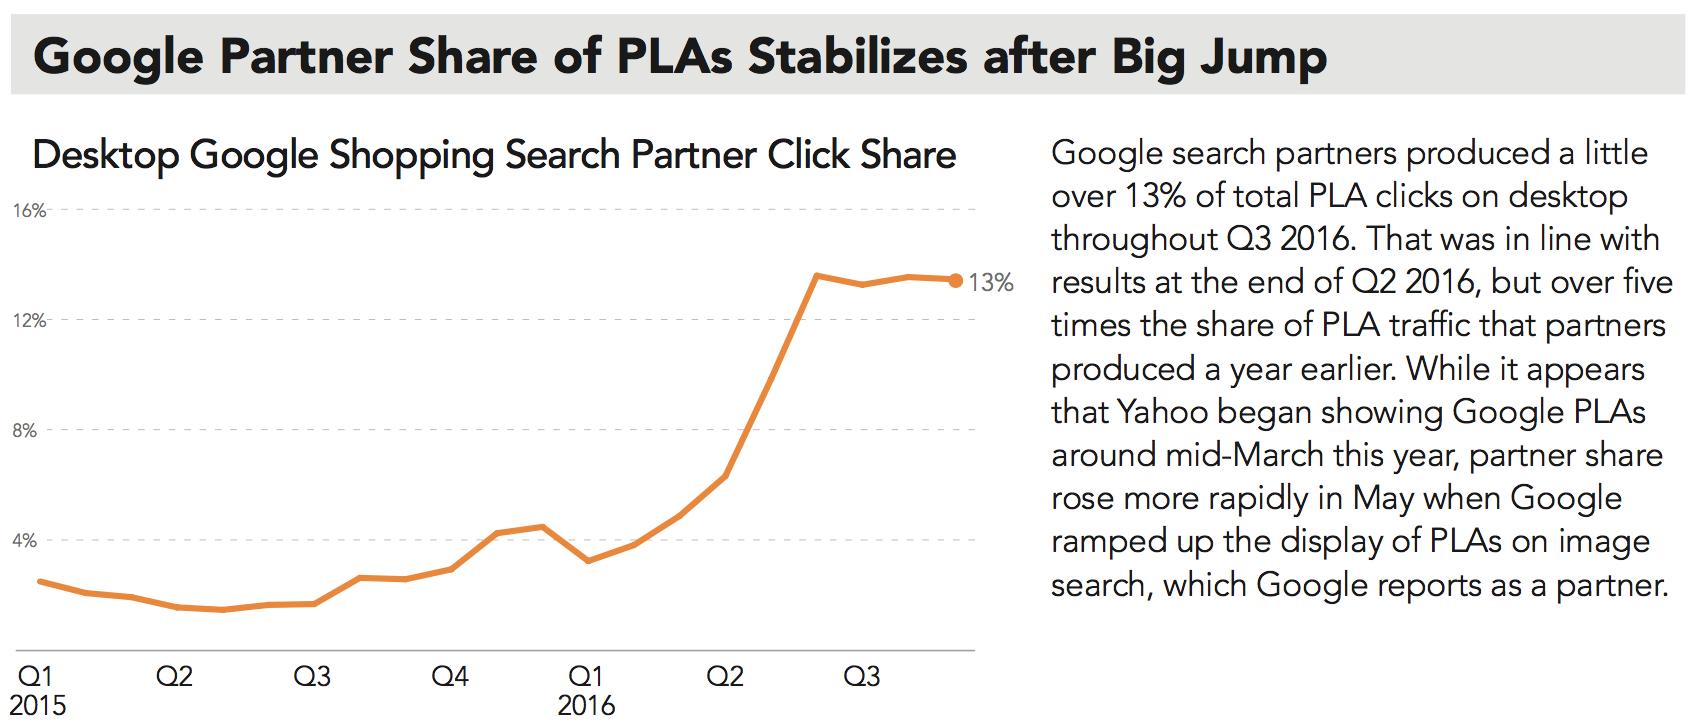 google-partner-share-of-pla